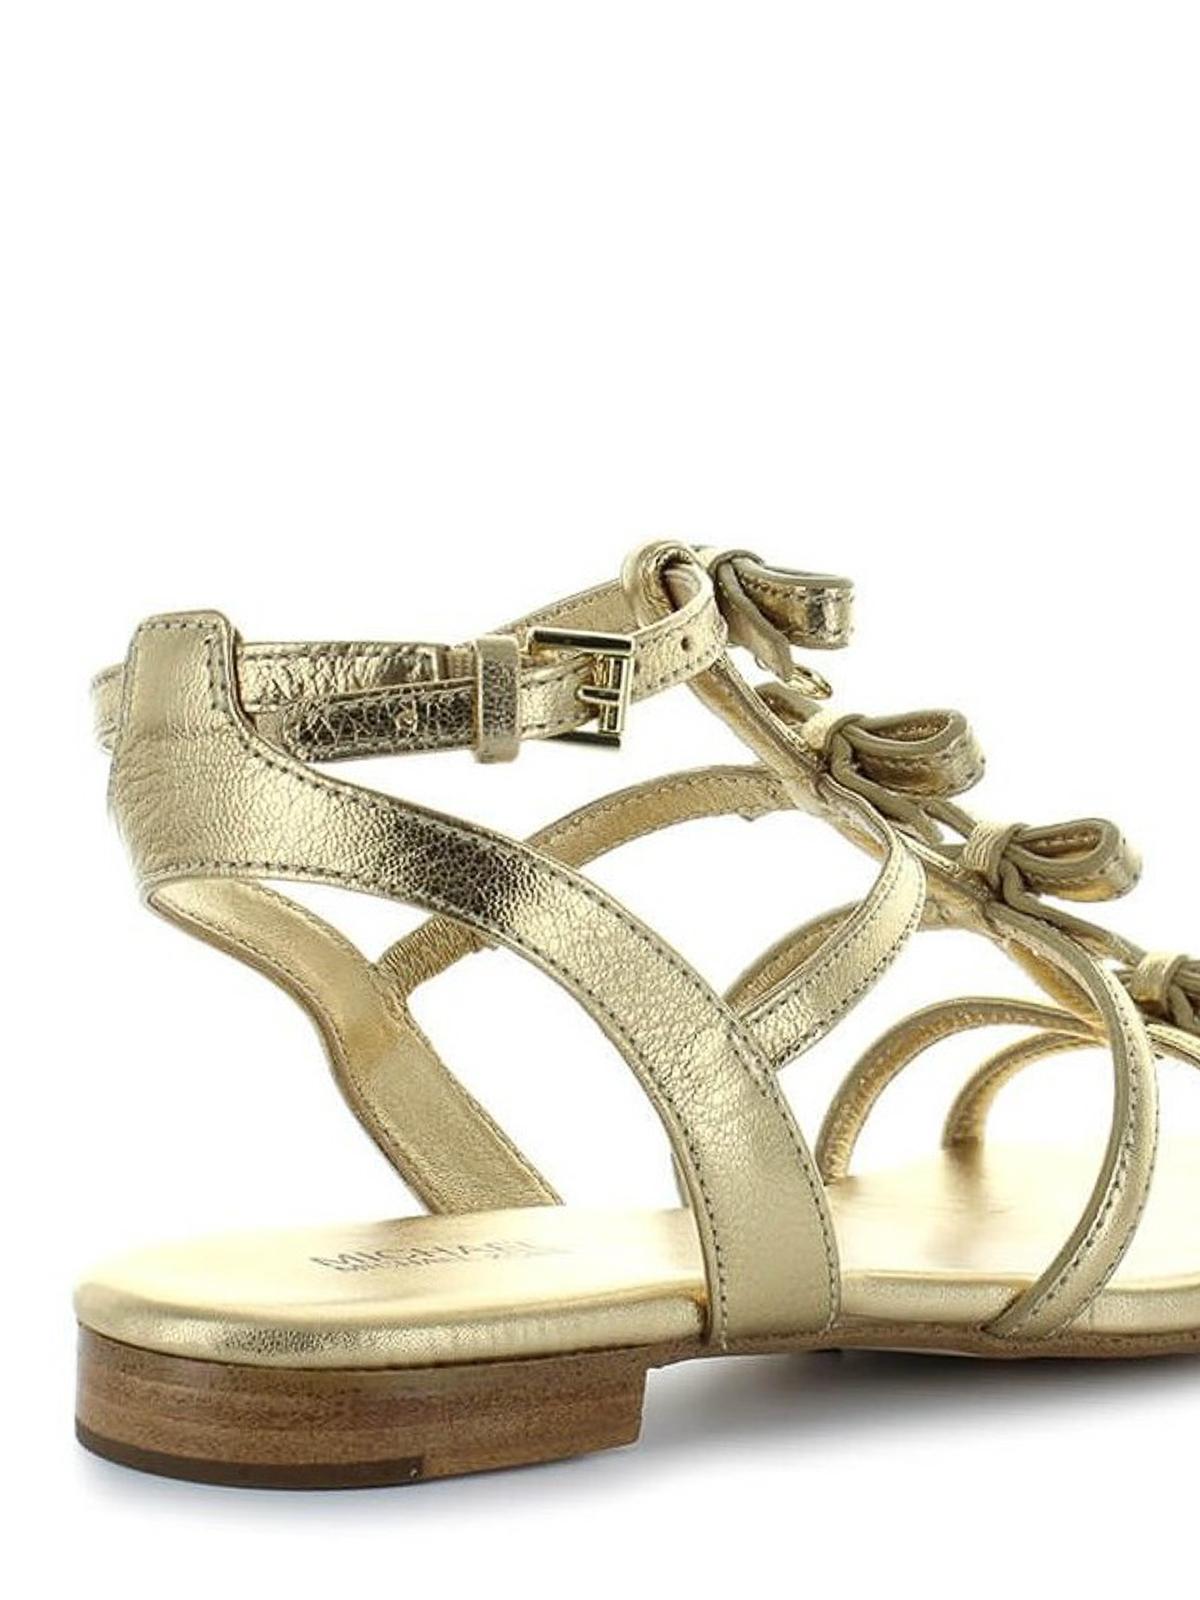 Michael Kors - Veronica golden flat